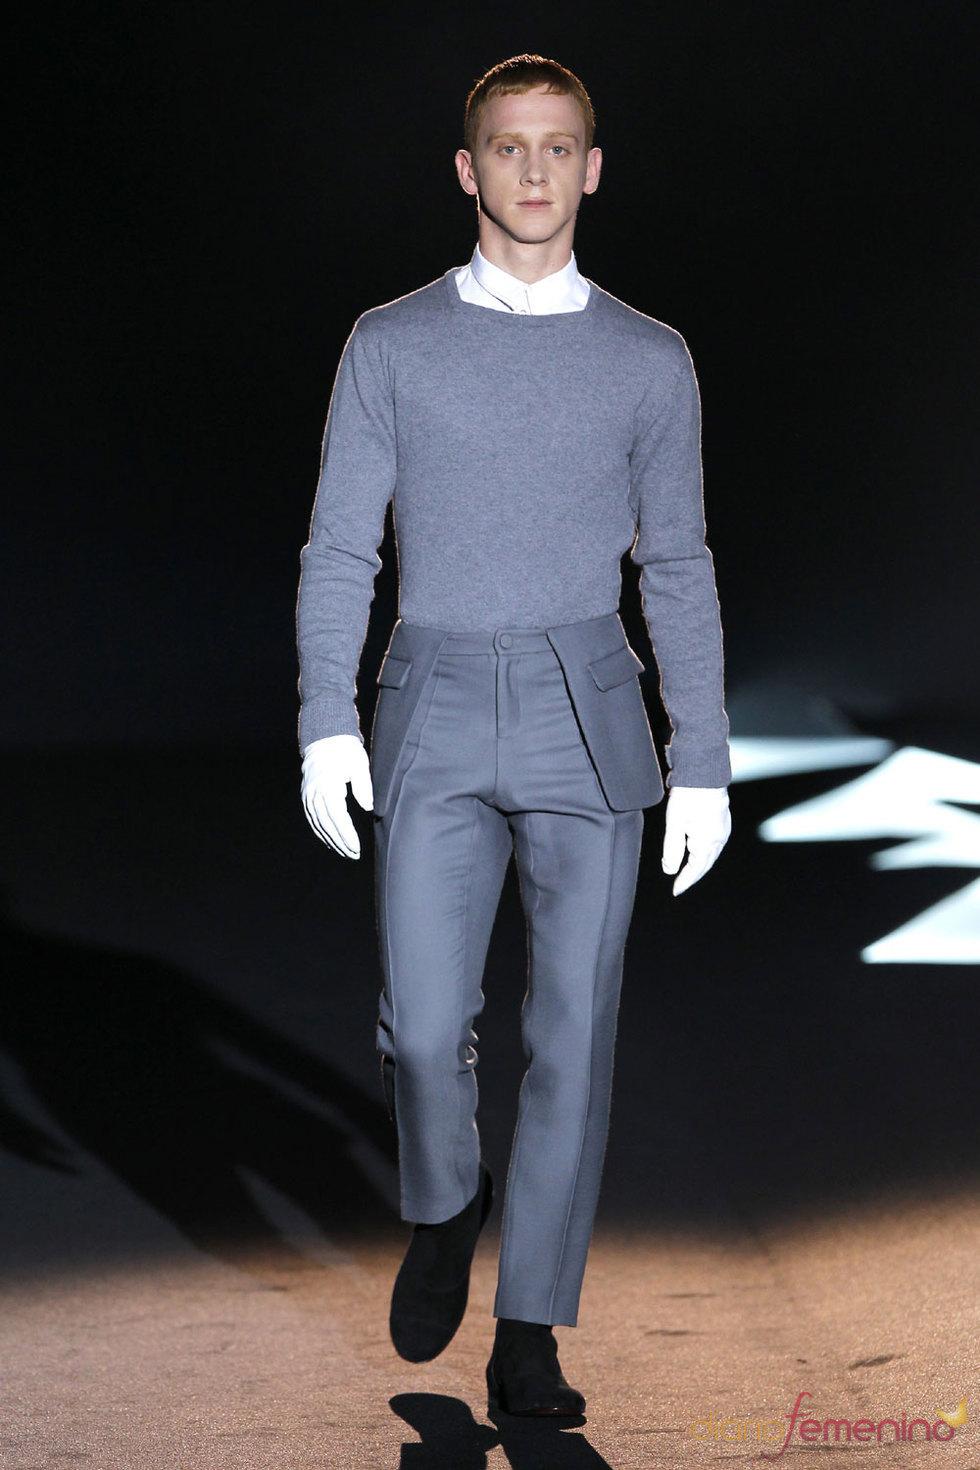 Moda Otoño Invierno 2010 - 2011 de Davidelfin